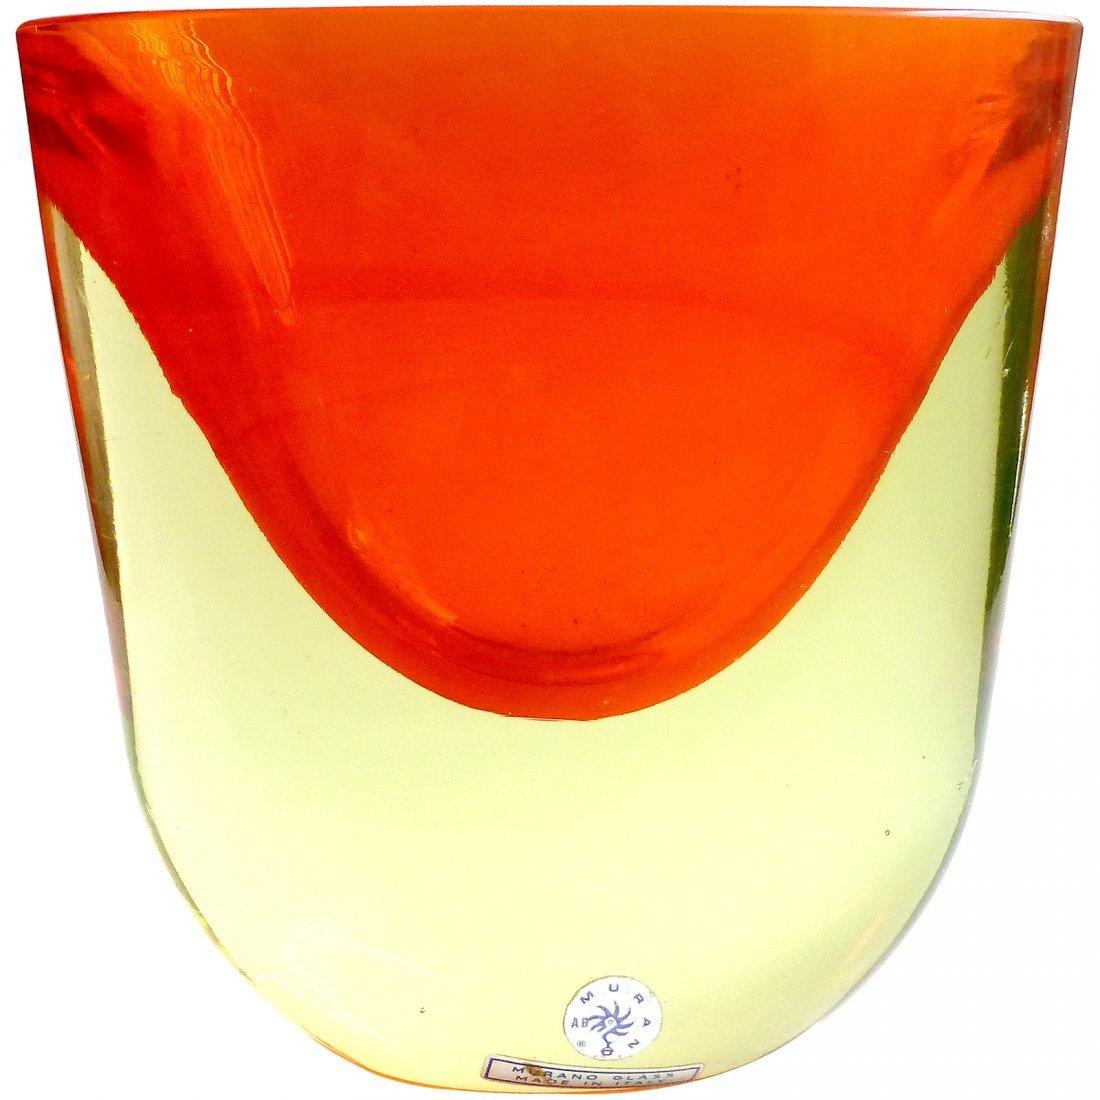 Antonio Da Ros Cenedese Murano Sommerso Vase